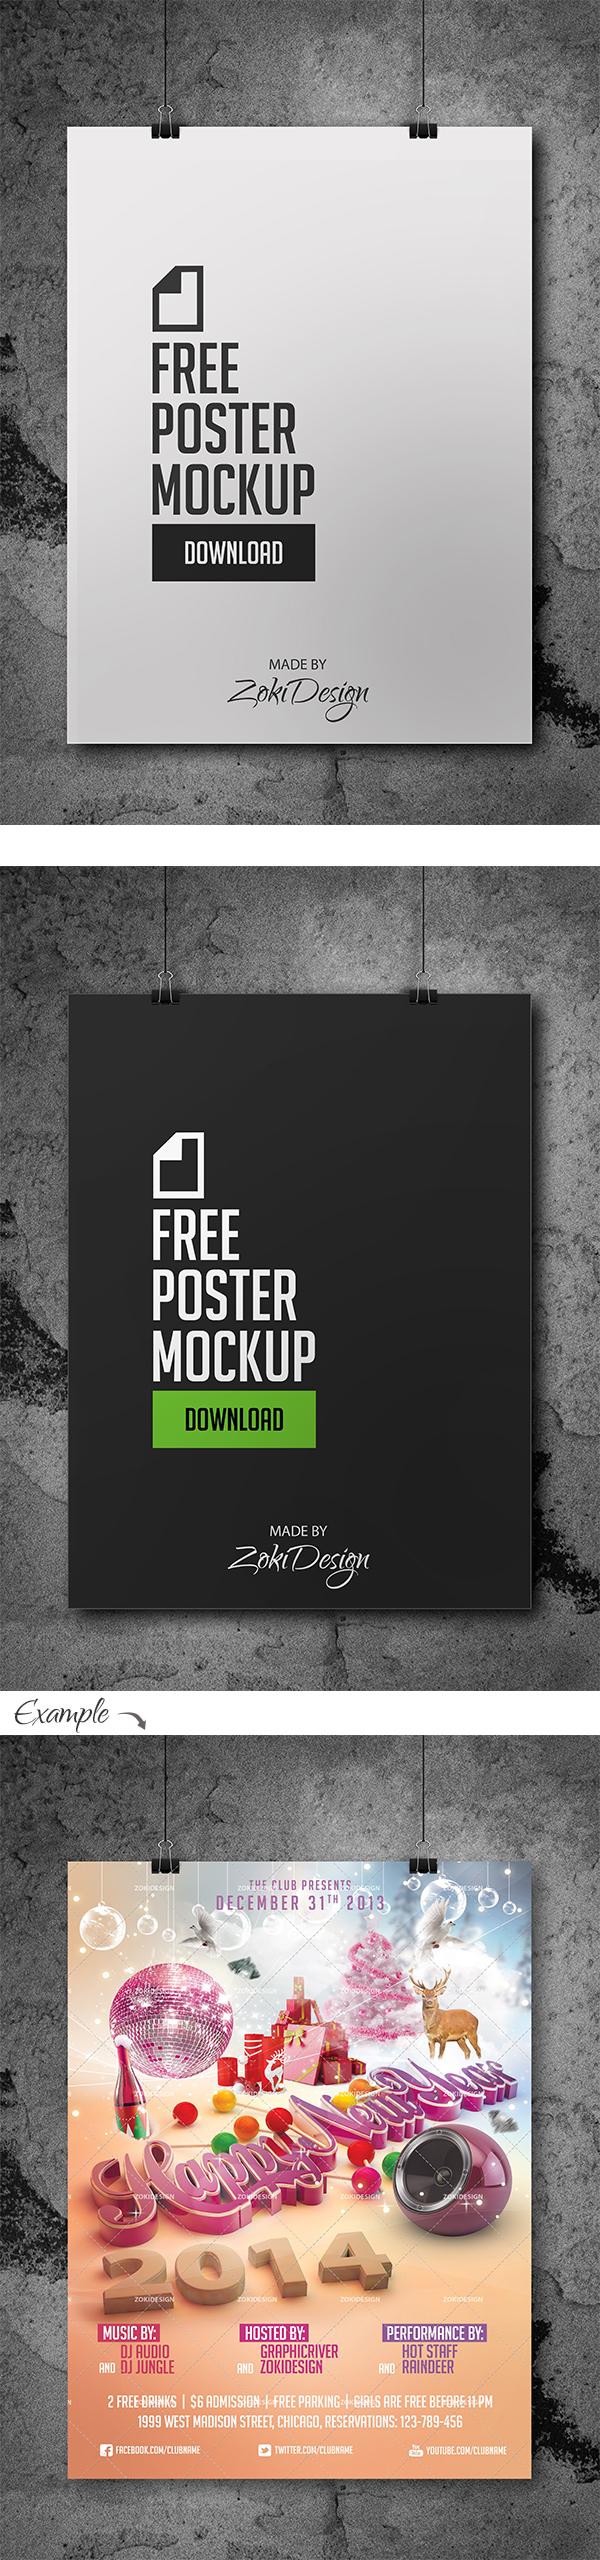 Free Poster Mockup On Behance Graphic Design Mockup Graphic Design Tools Poster Mockup